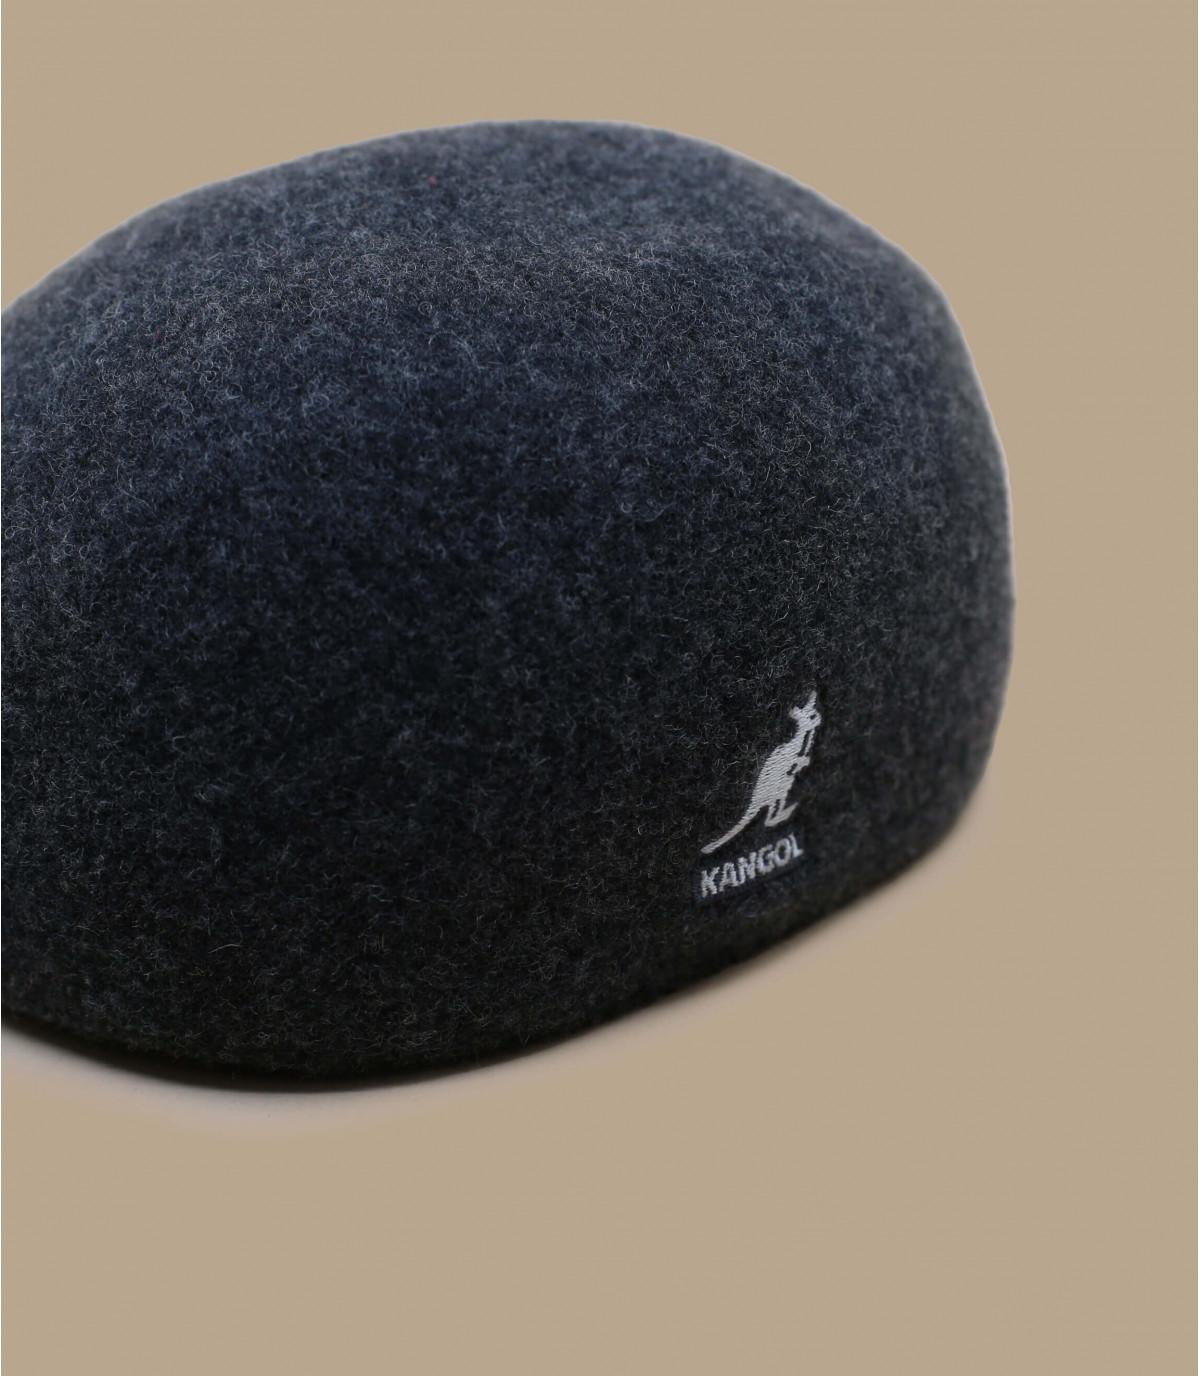 Detalles Seamless Wool 507 dk flannel imagen 2